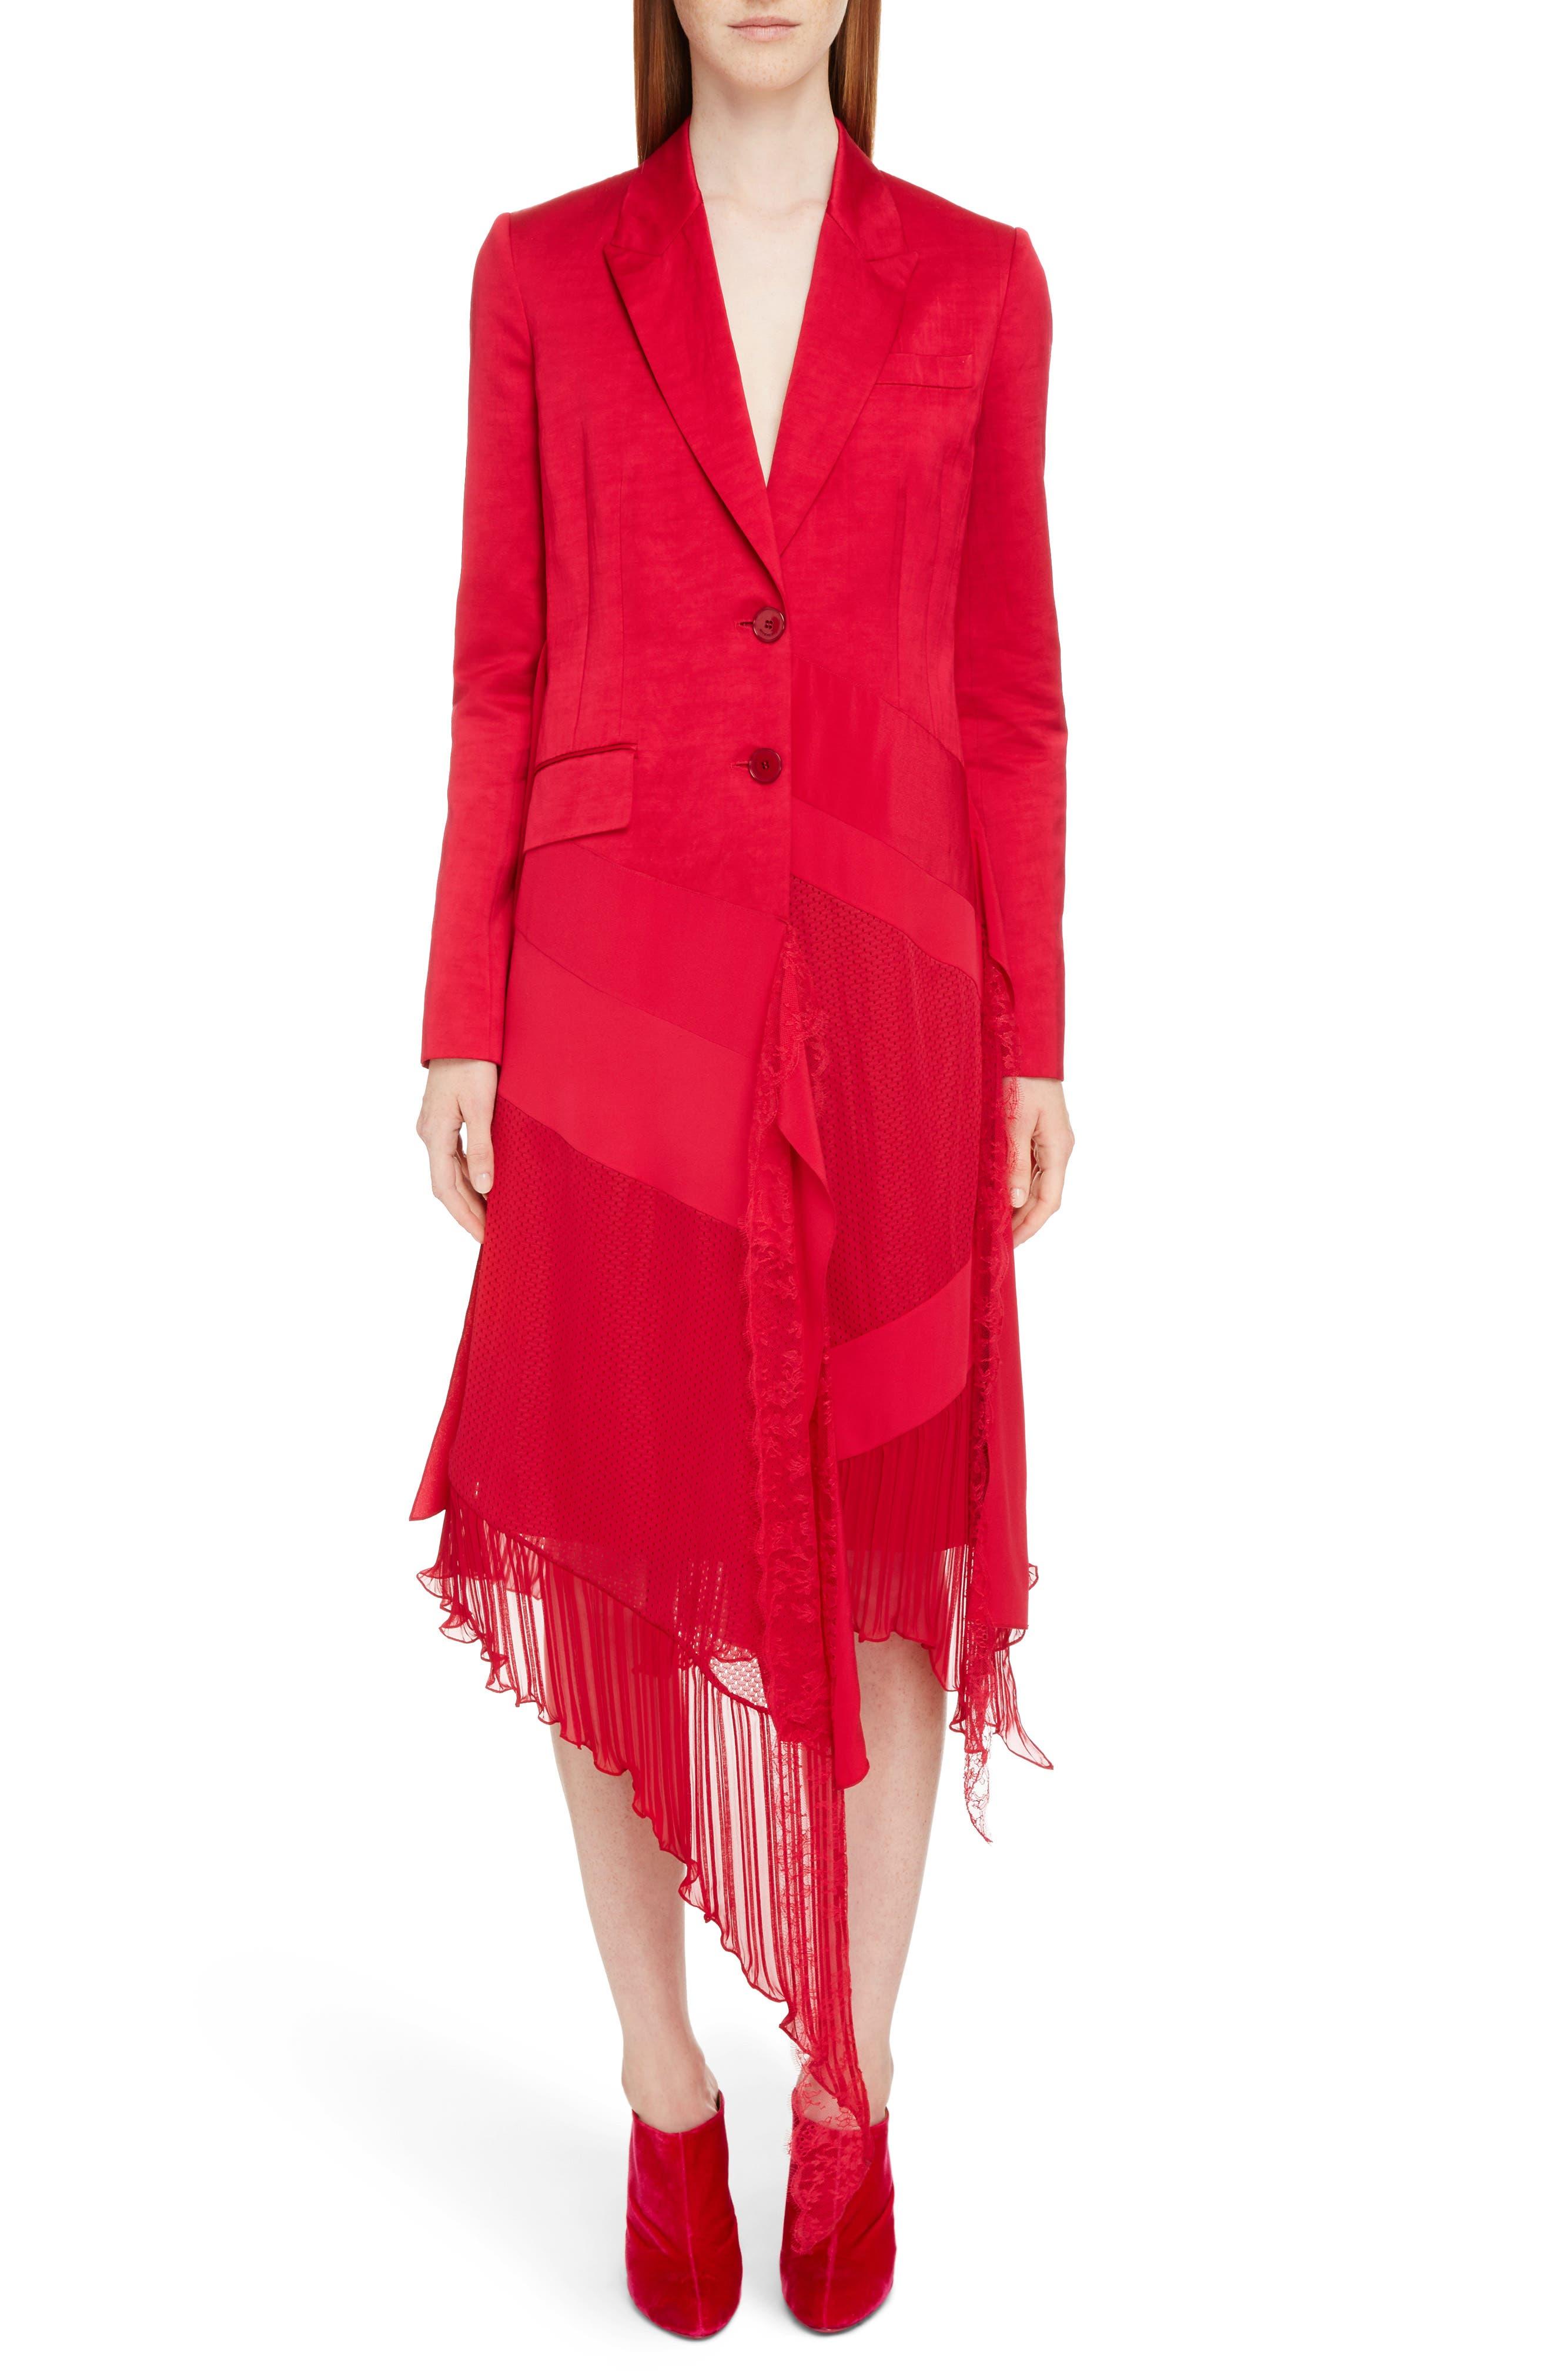 Main Image - Givenchy Satin Patchwork Jacket